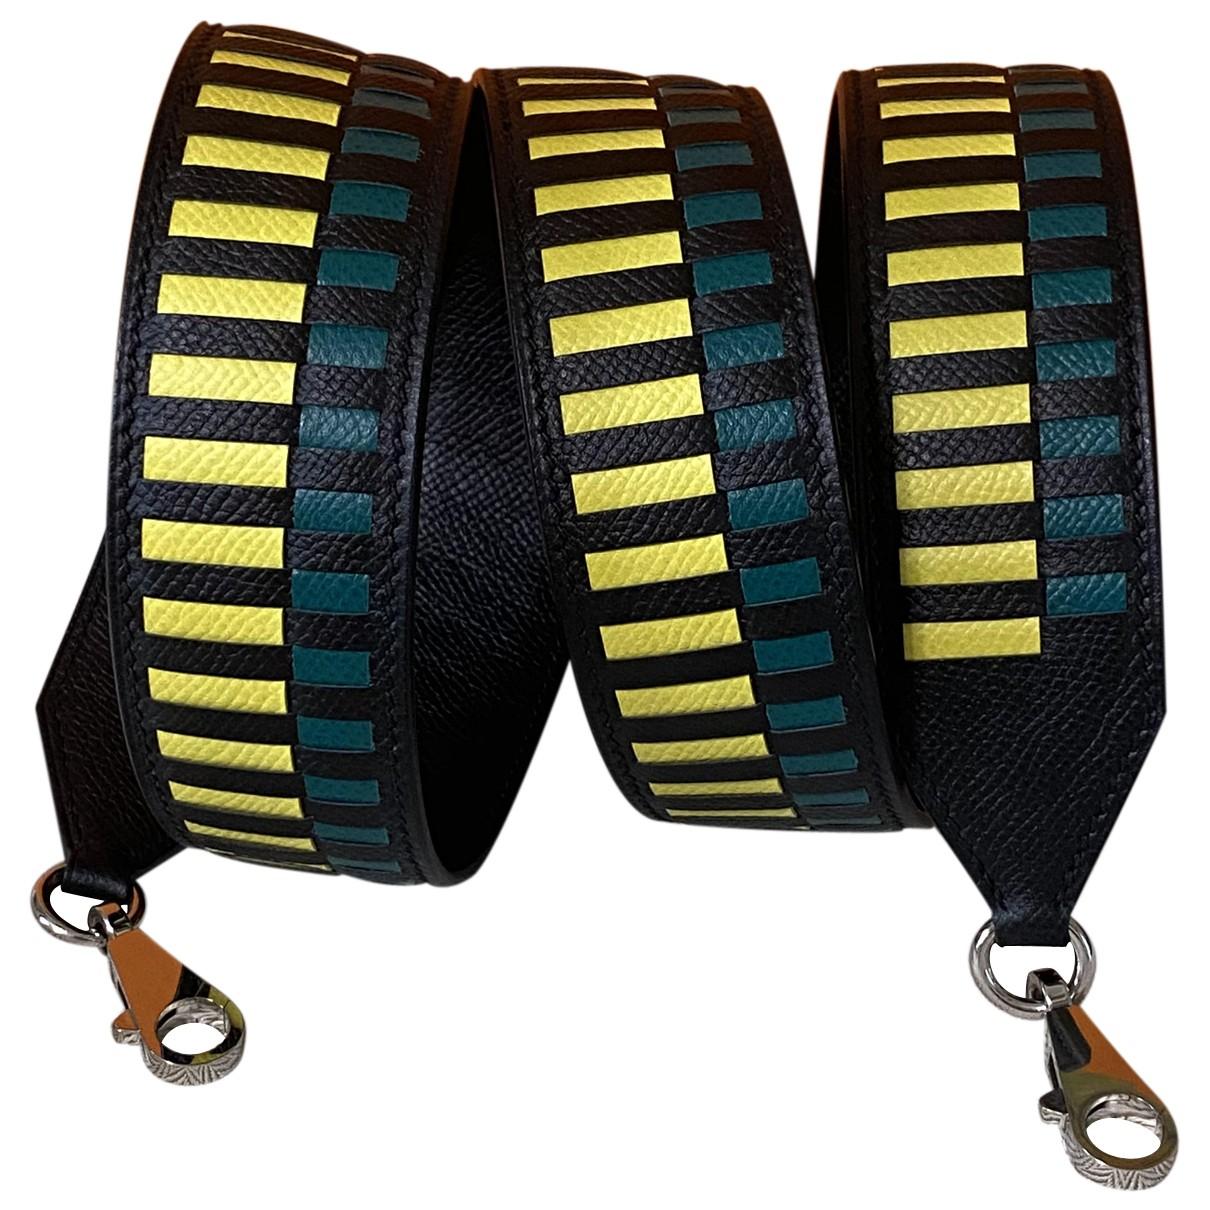 Hermès N Multicolour Leather Purses, wallet & cases for Women N